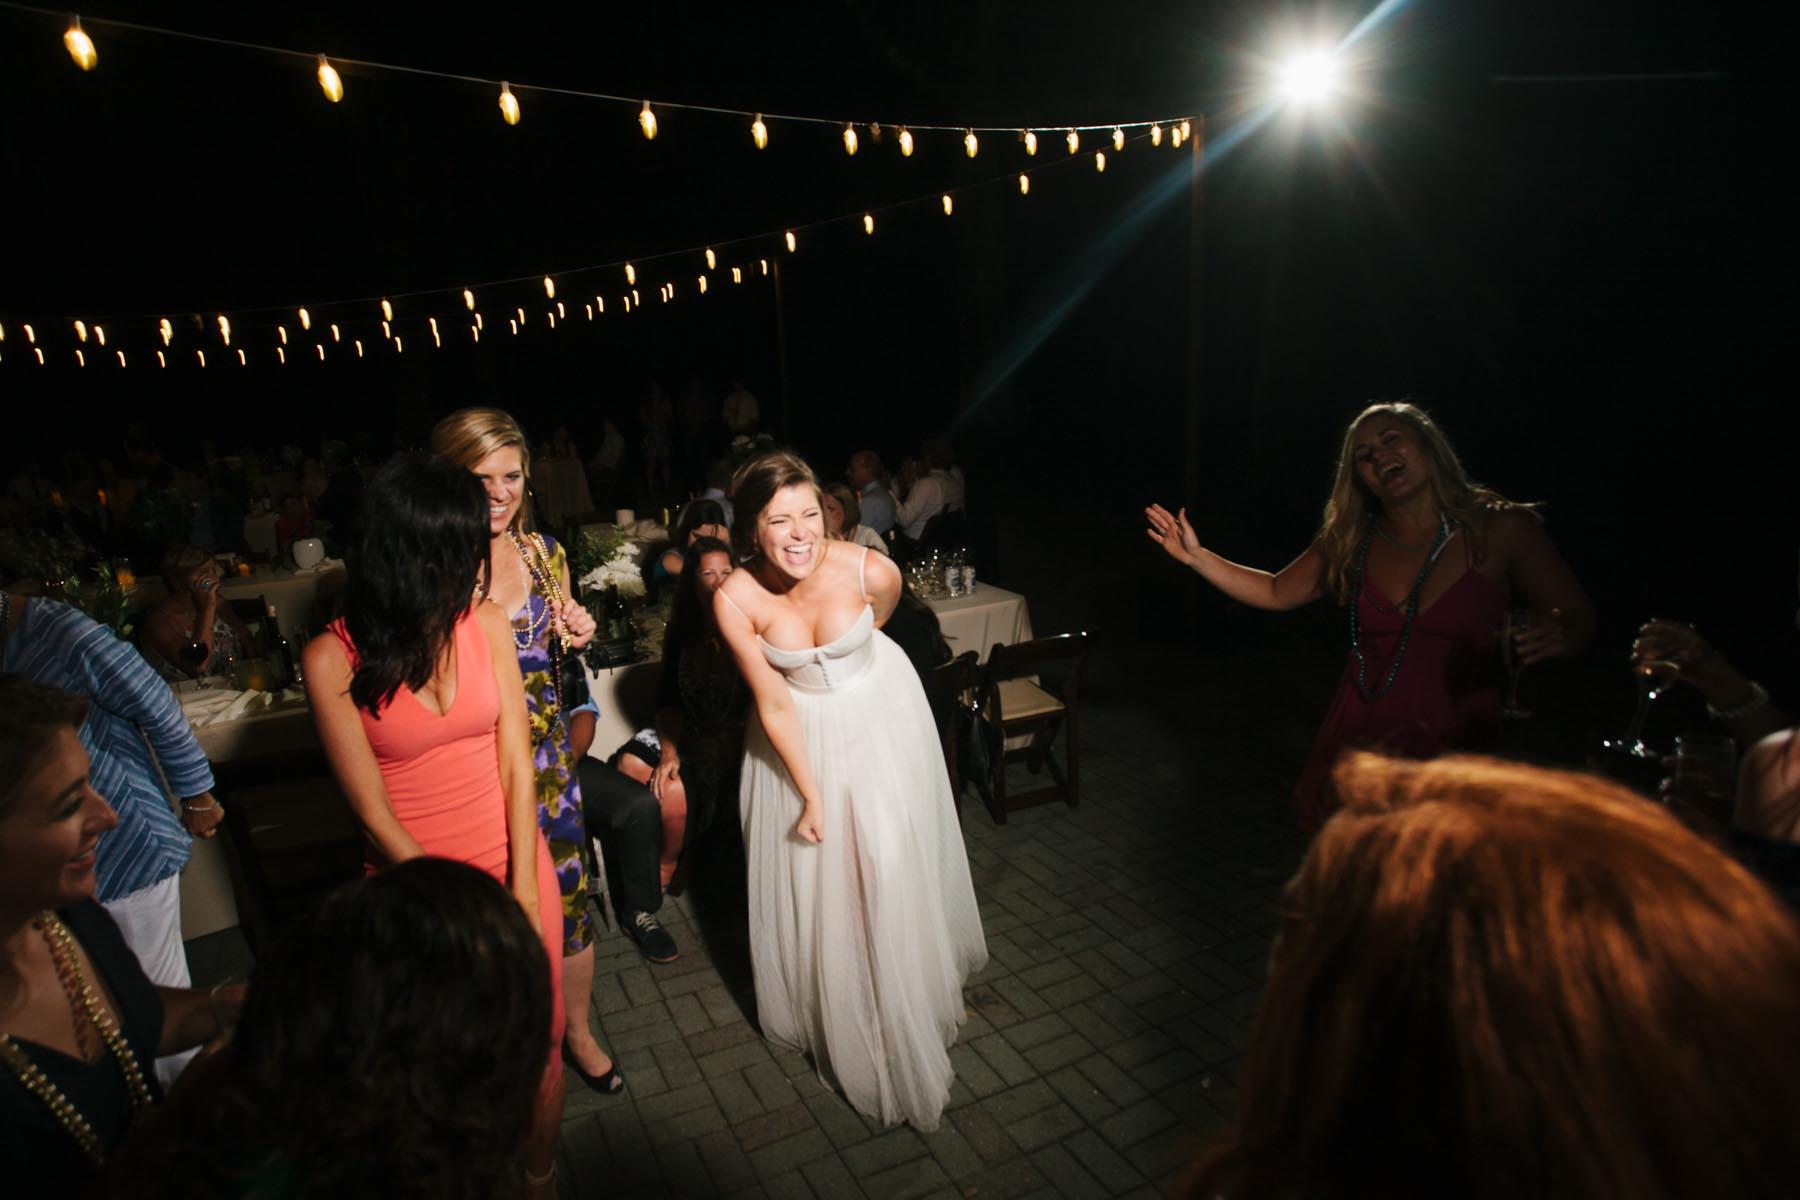 lowry wedding blog eden garden florida wedding-155